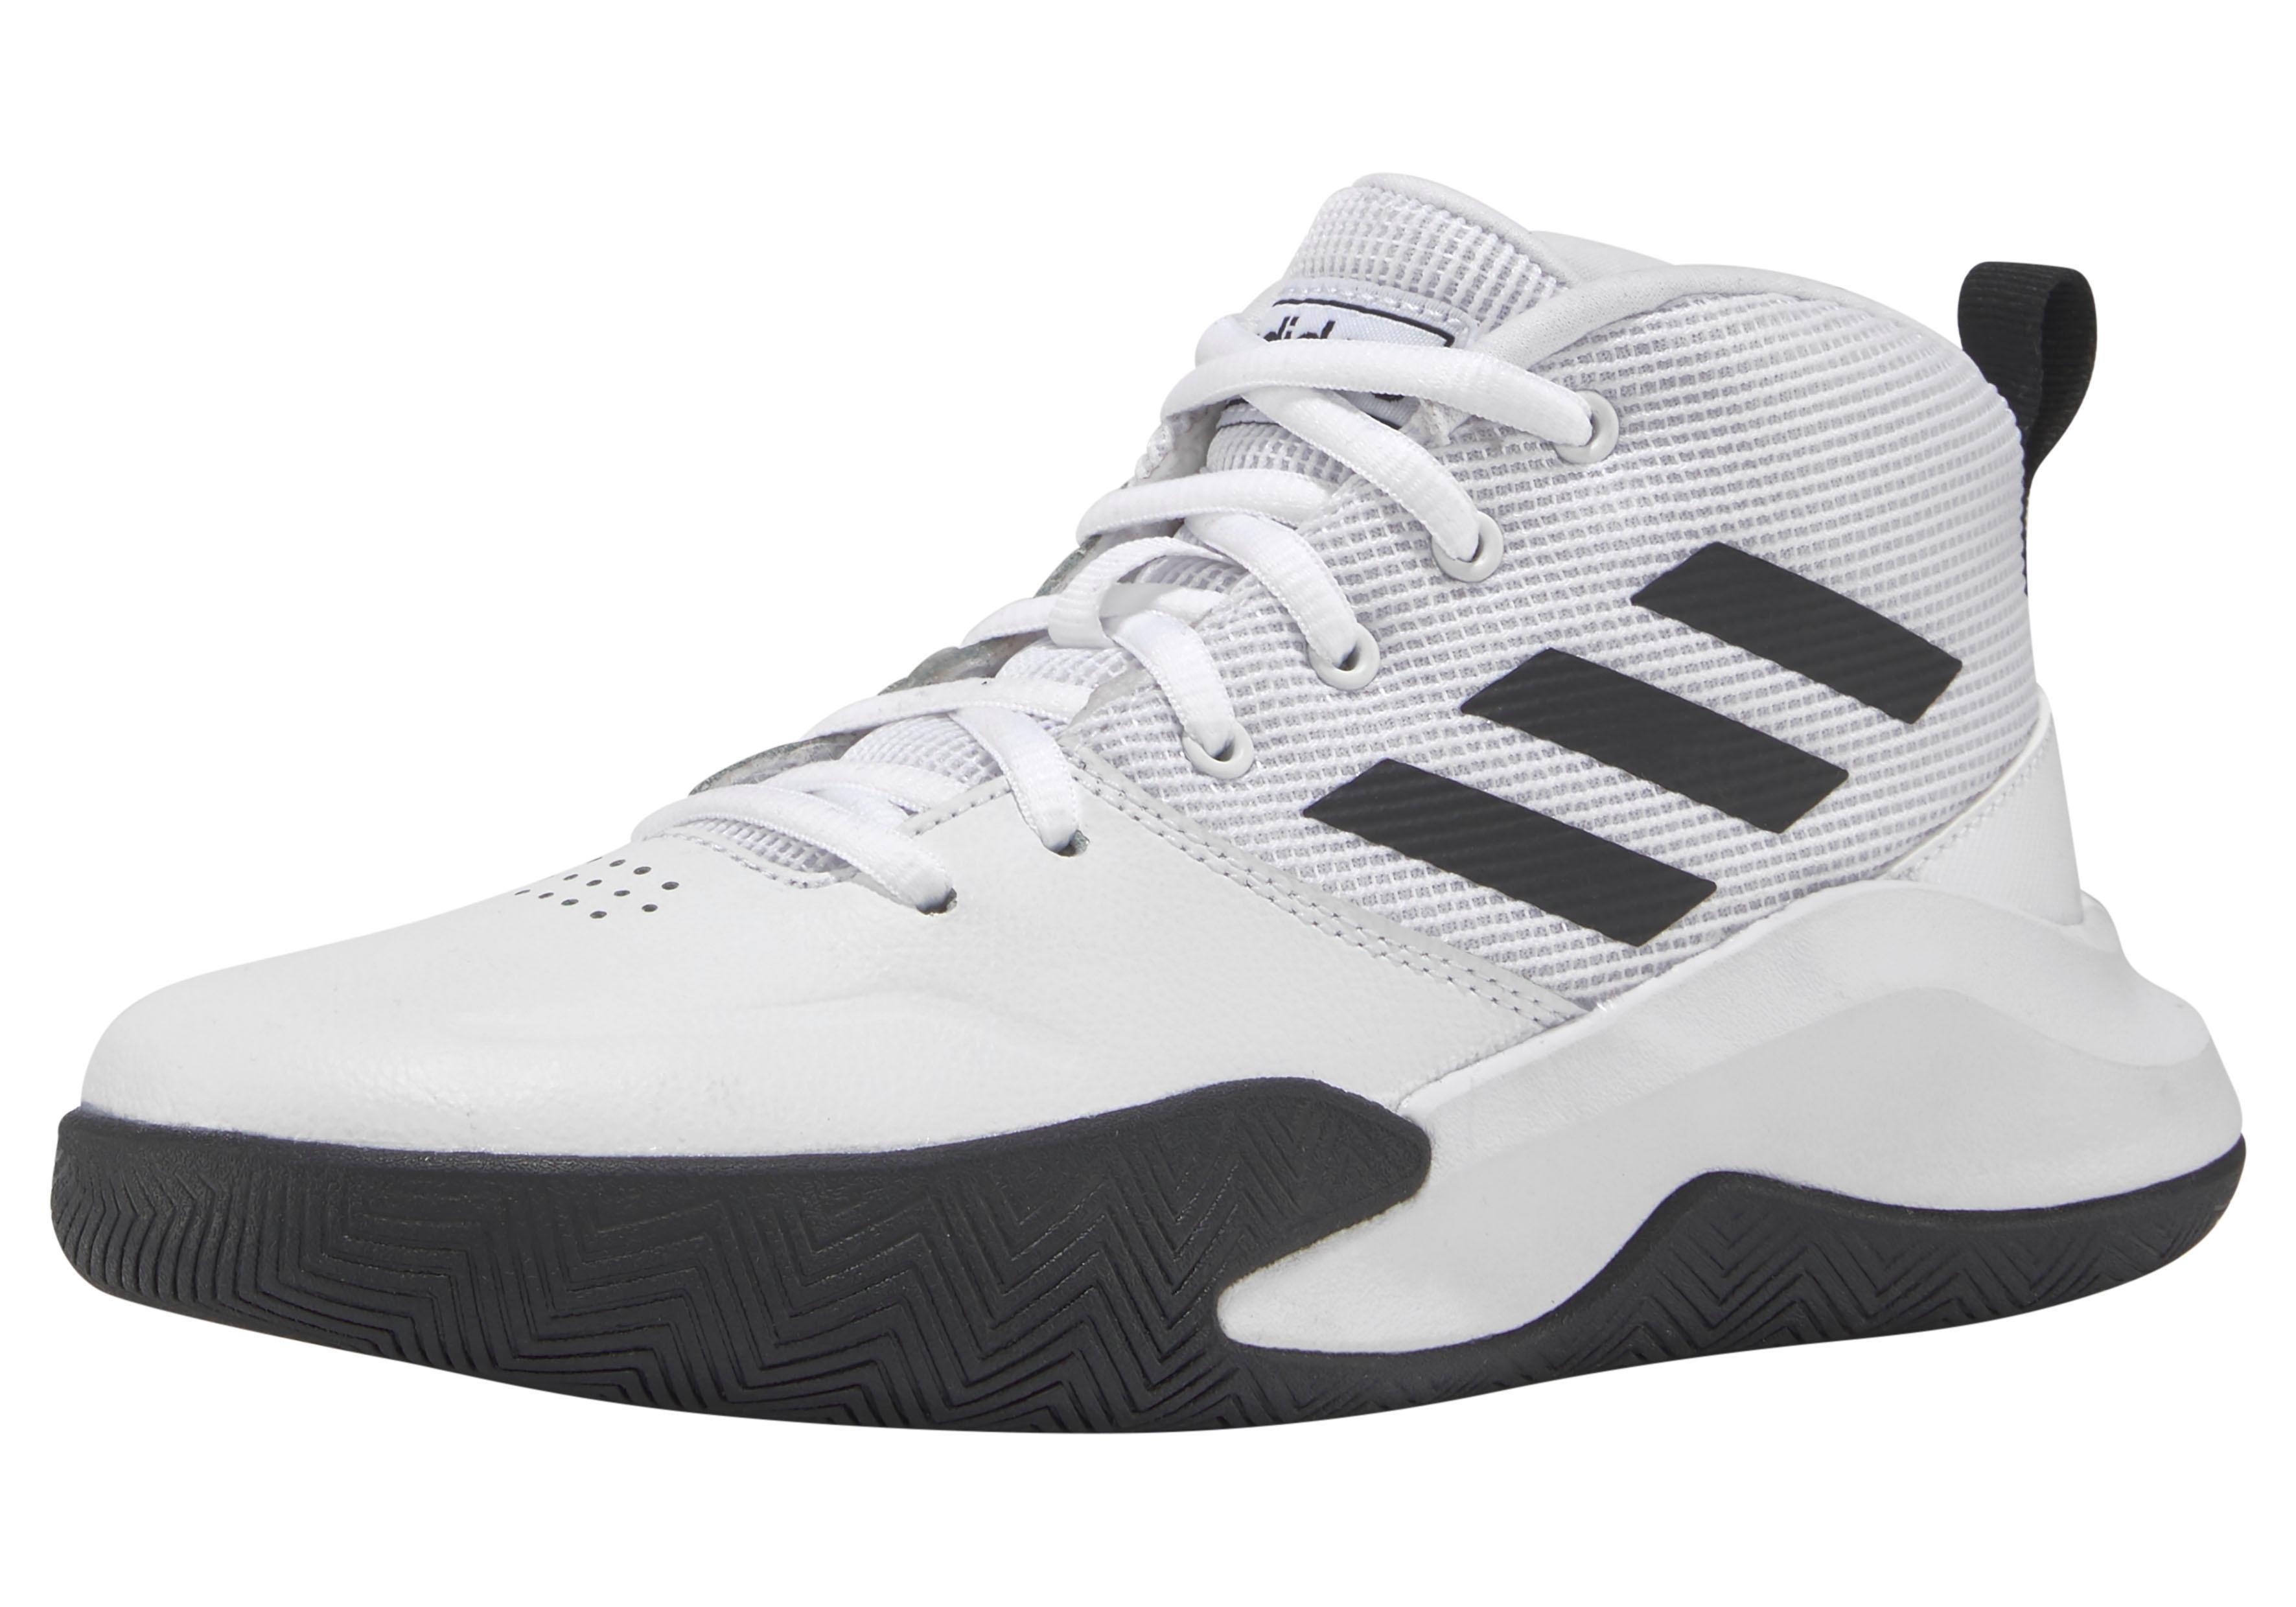 adidas Performance basketbalschoenen »OWNTHEGAME K WIDE« veilig op otto.nl kopen